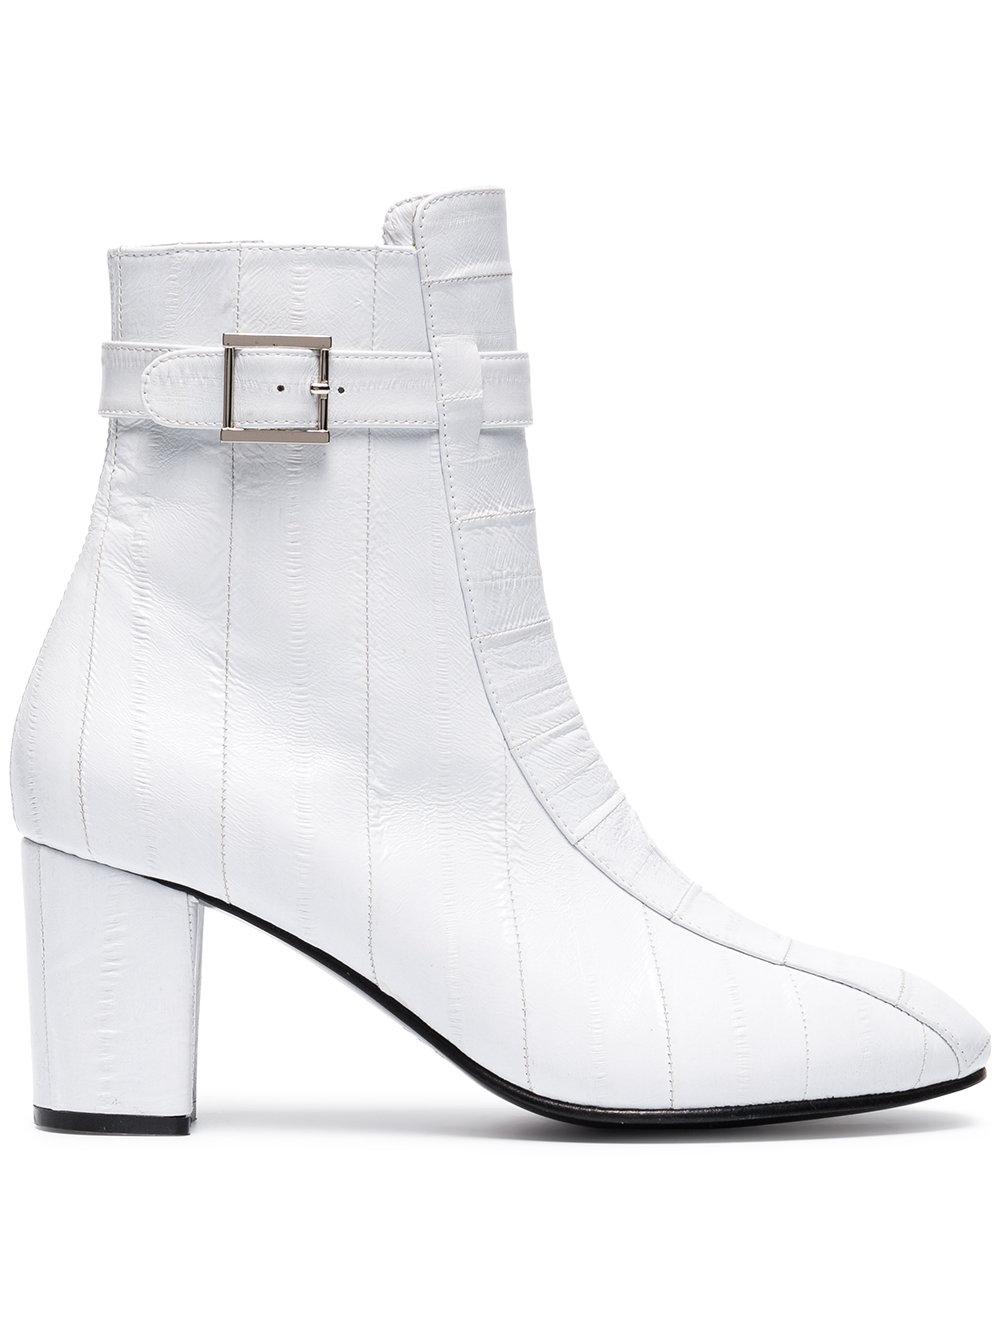 NEWBARK White Leather Sabrina 75 Boots $1,104,  Farfetch.com